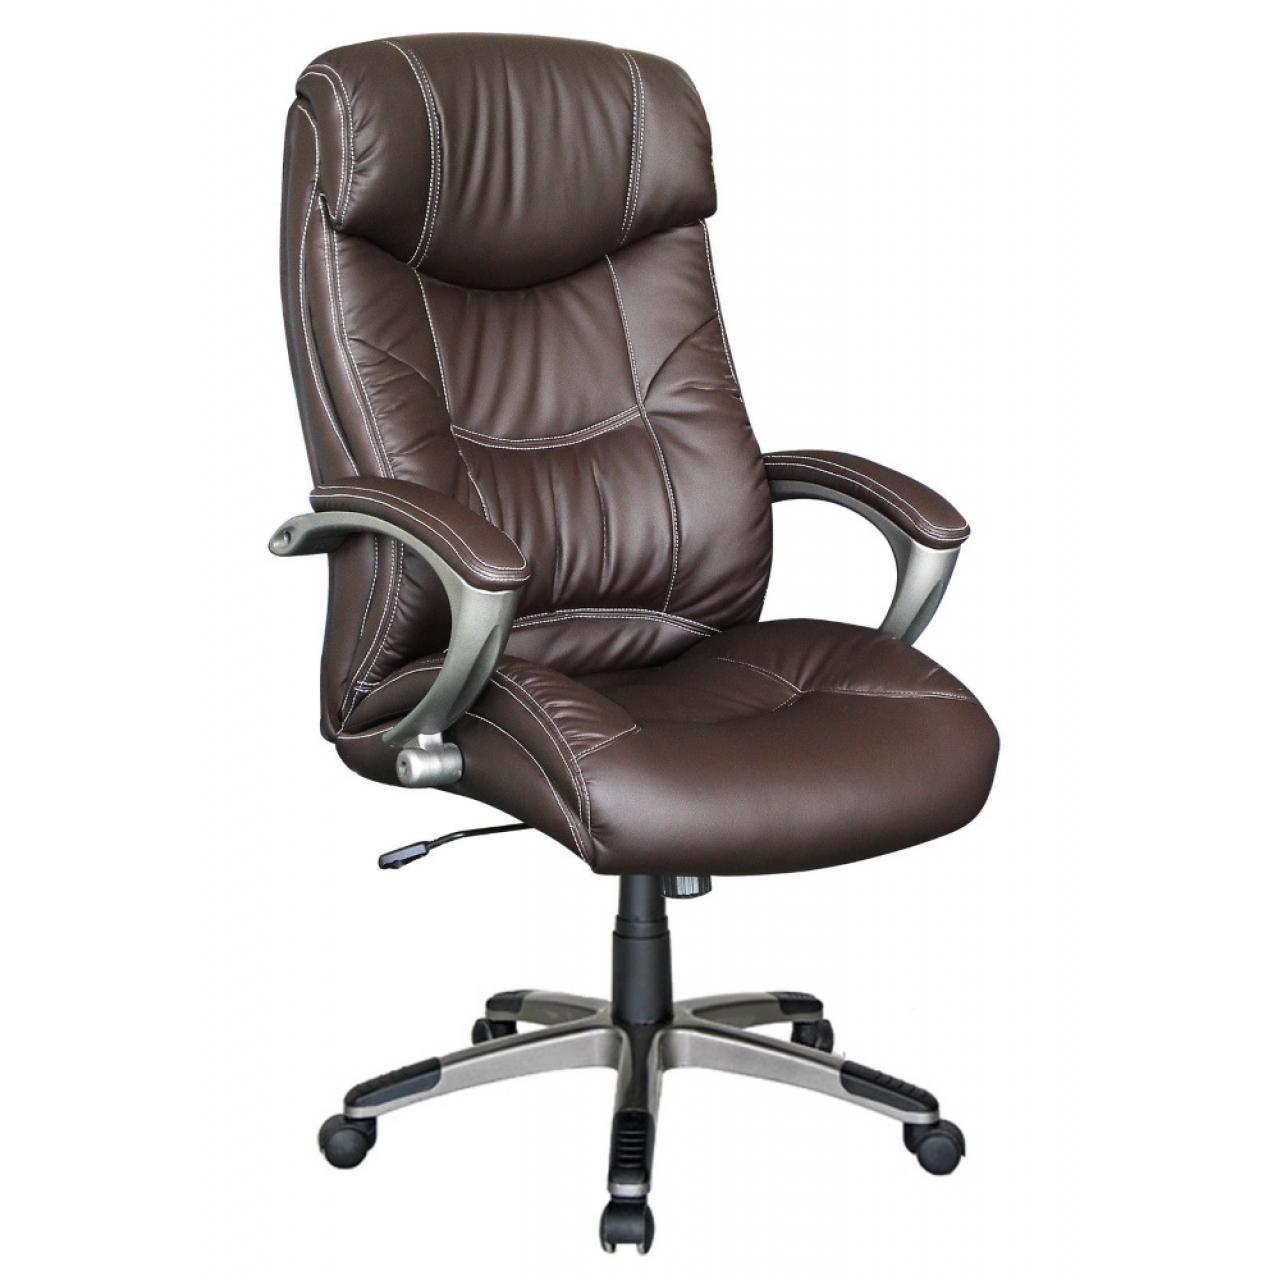 Chefsessel Comfort XL